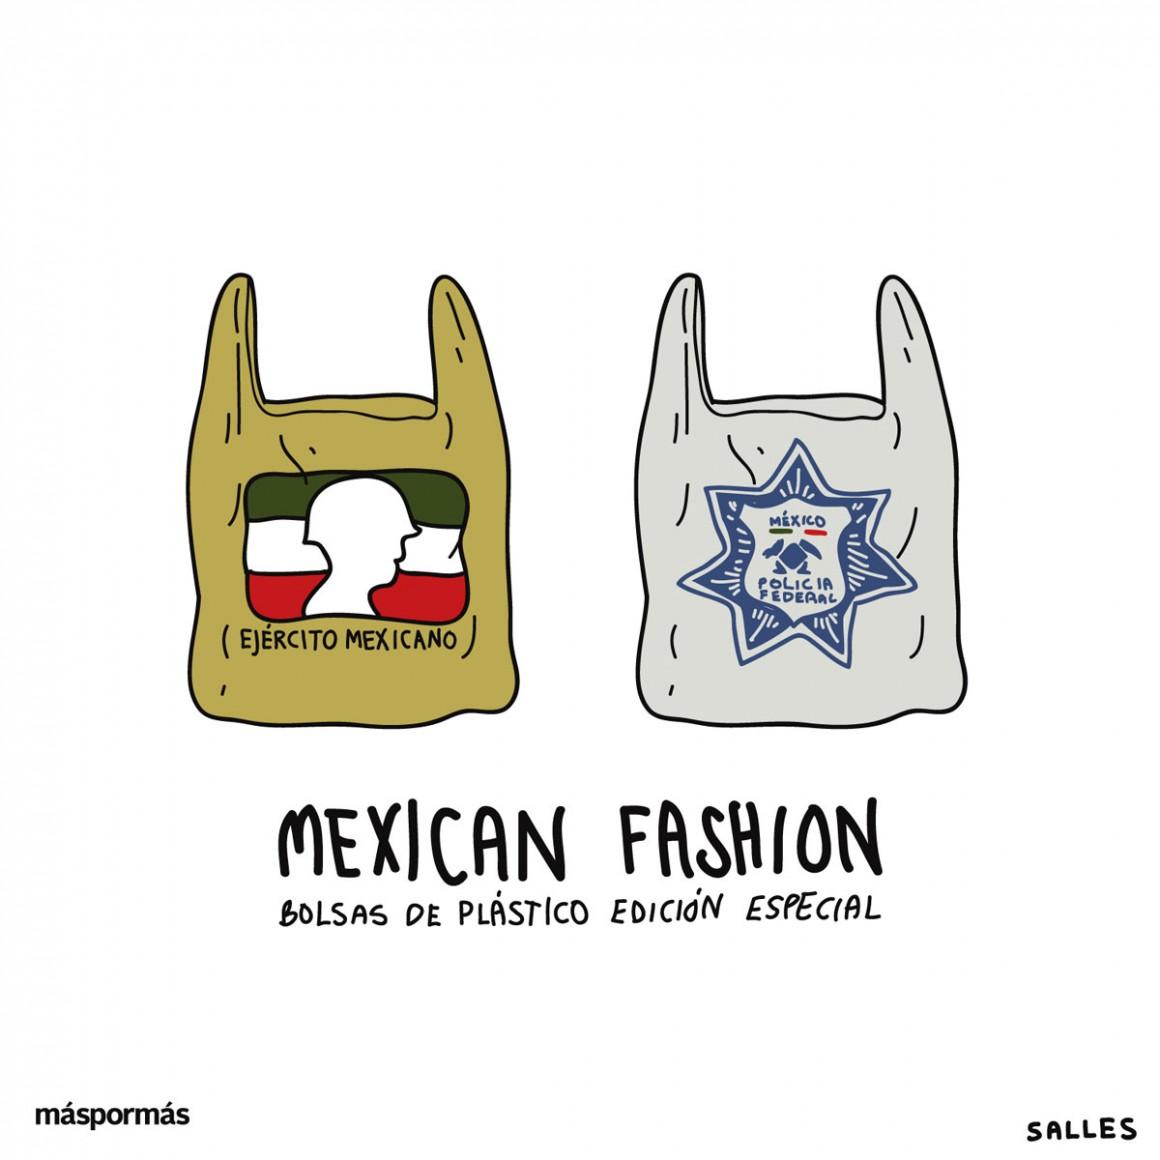 mexicanfashion